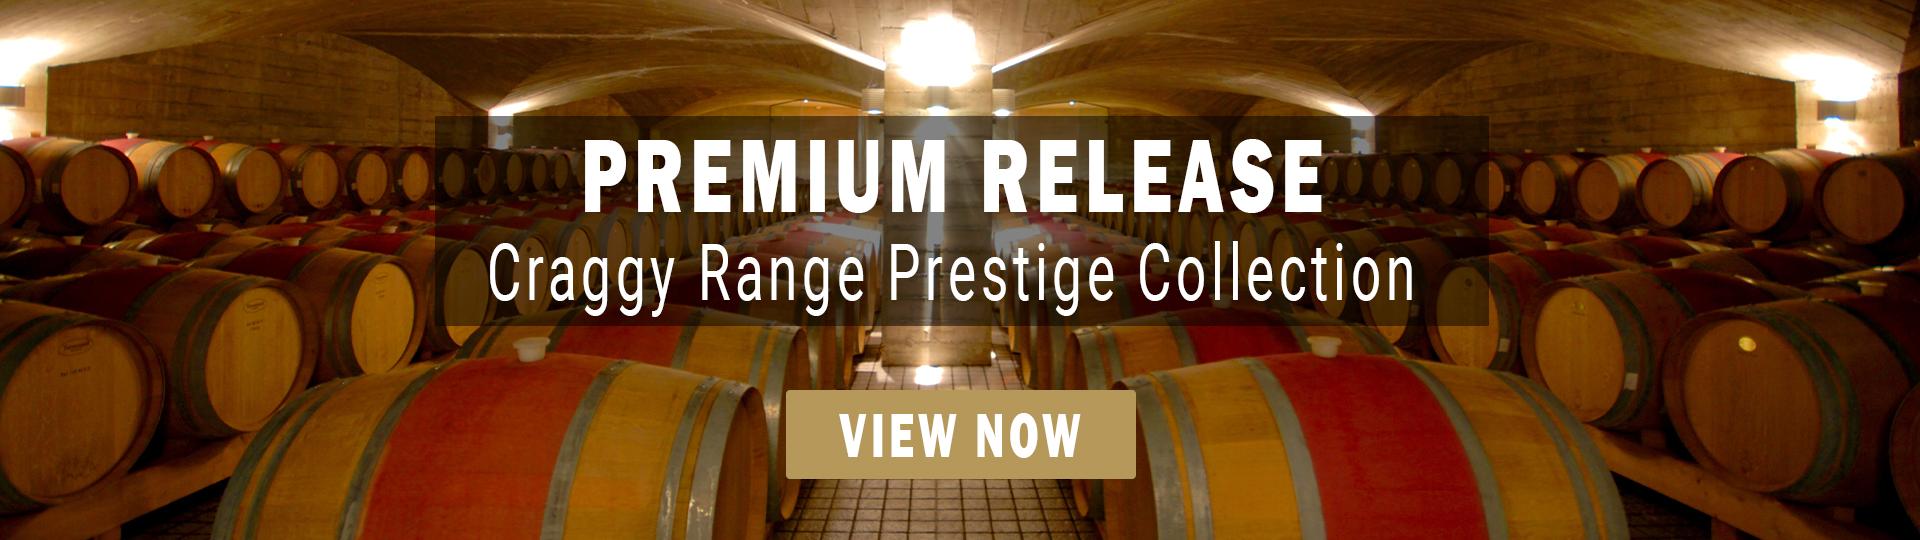 Craggy Range Prestige Collection Wines